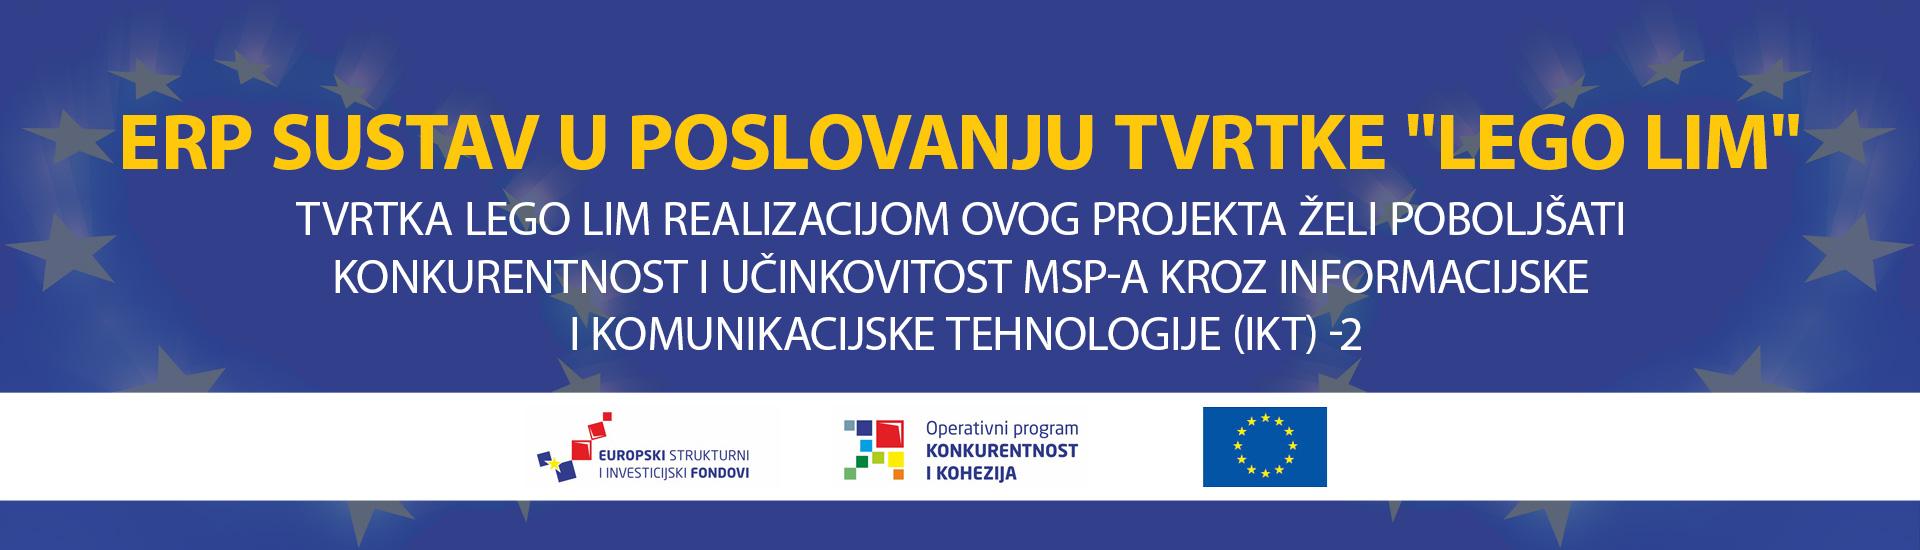 http://www.legolim.hr/Repository/Banners/ERP-SUSTAV-U-POSLOVANJU-TVRTKE-LEGO-LIM-012020.jpg